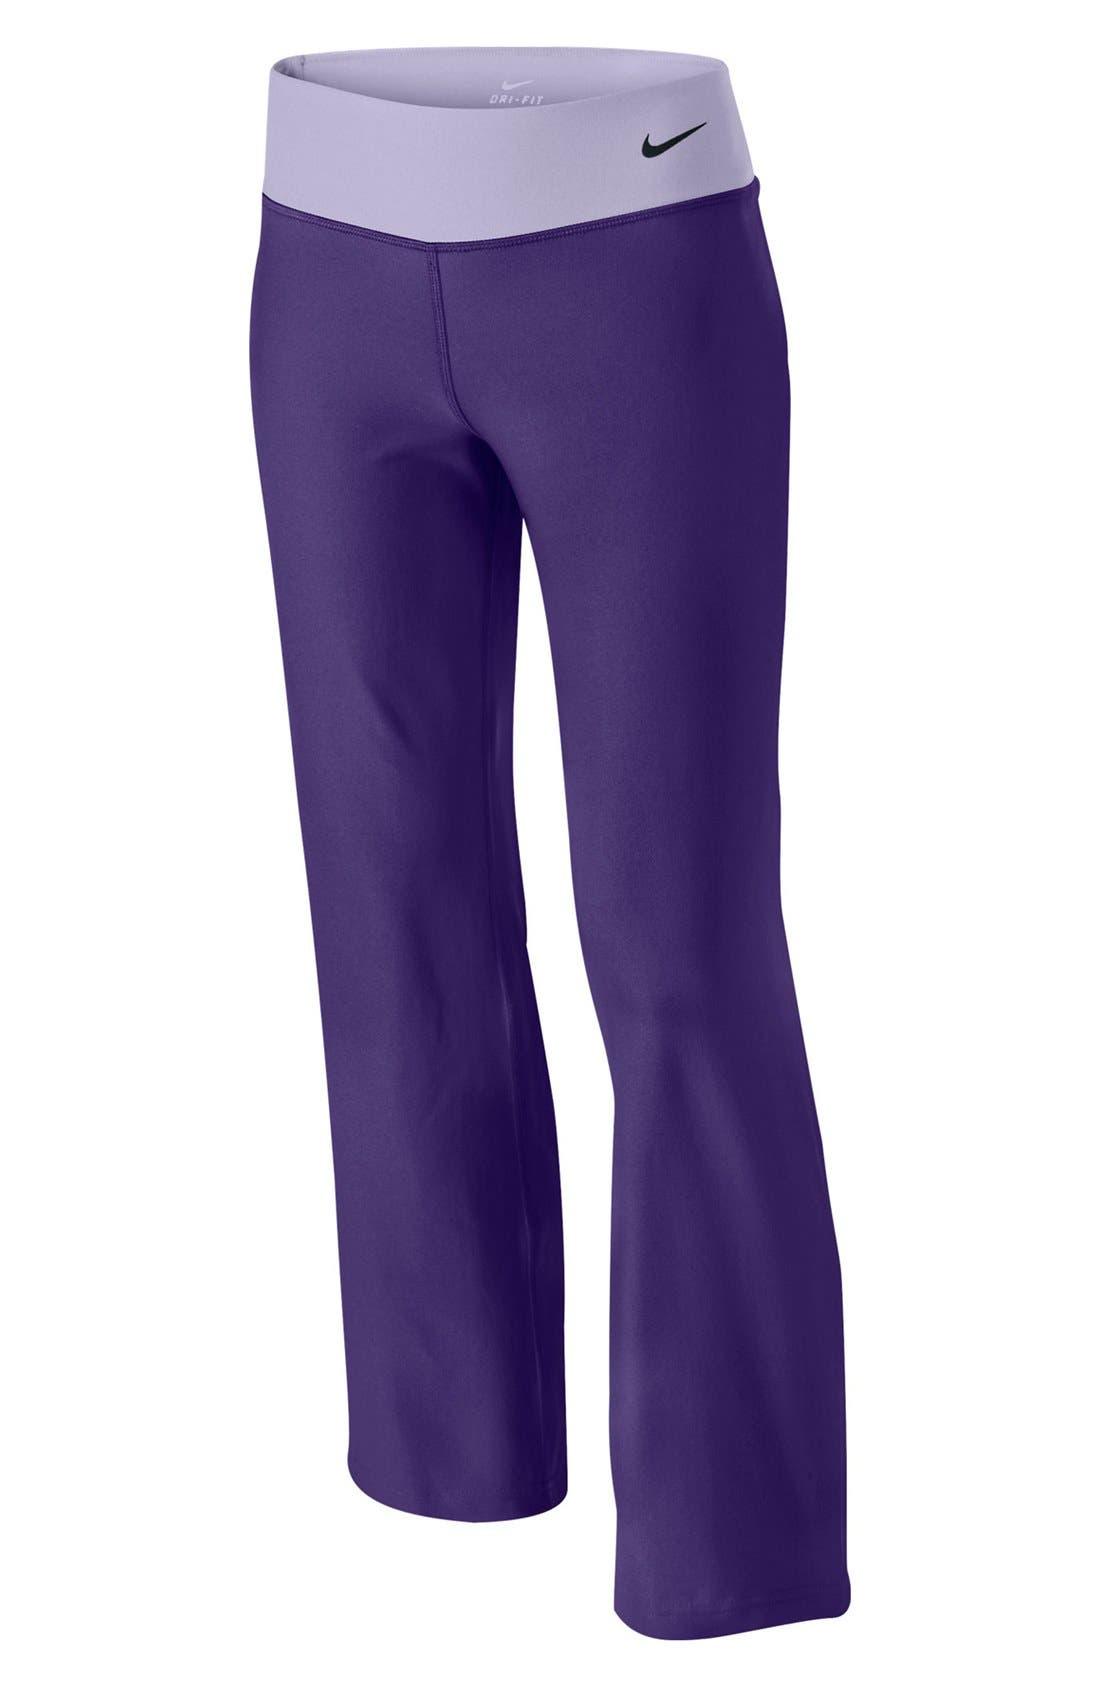 Alternate Image 1 Selected - Nike 'Legend' Pants (Big Girls)